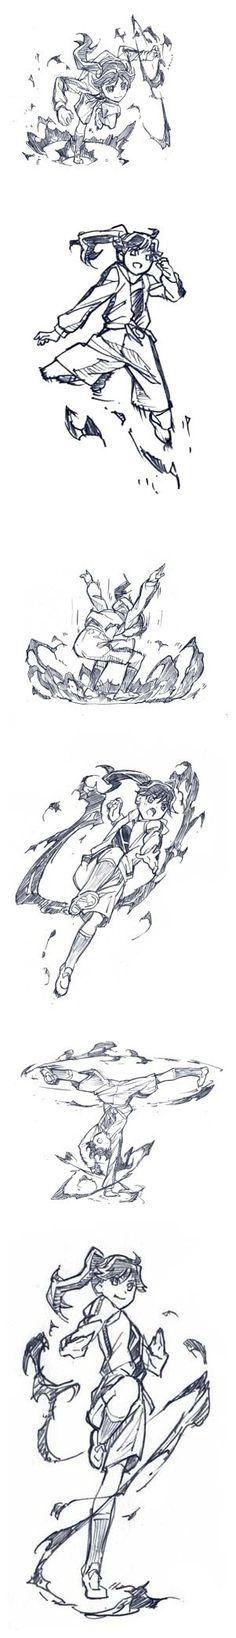 Girl doing action poses: jumping, landing, fighting - drawing reference Body Drawing, Manga Drawing, Figure Drawing, Drawing Reference, Manga Art, Character Poses, Character Design References, Character Concept, Character Art